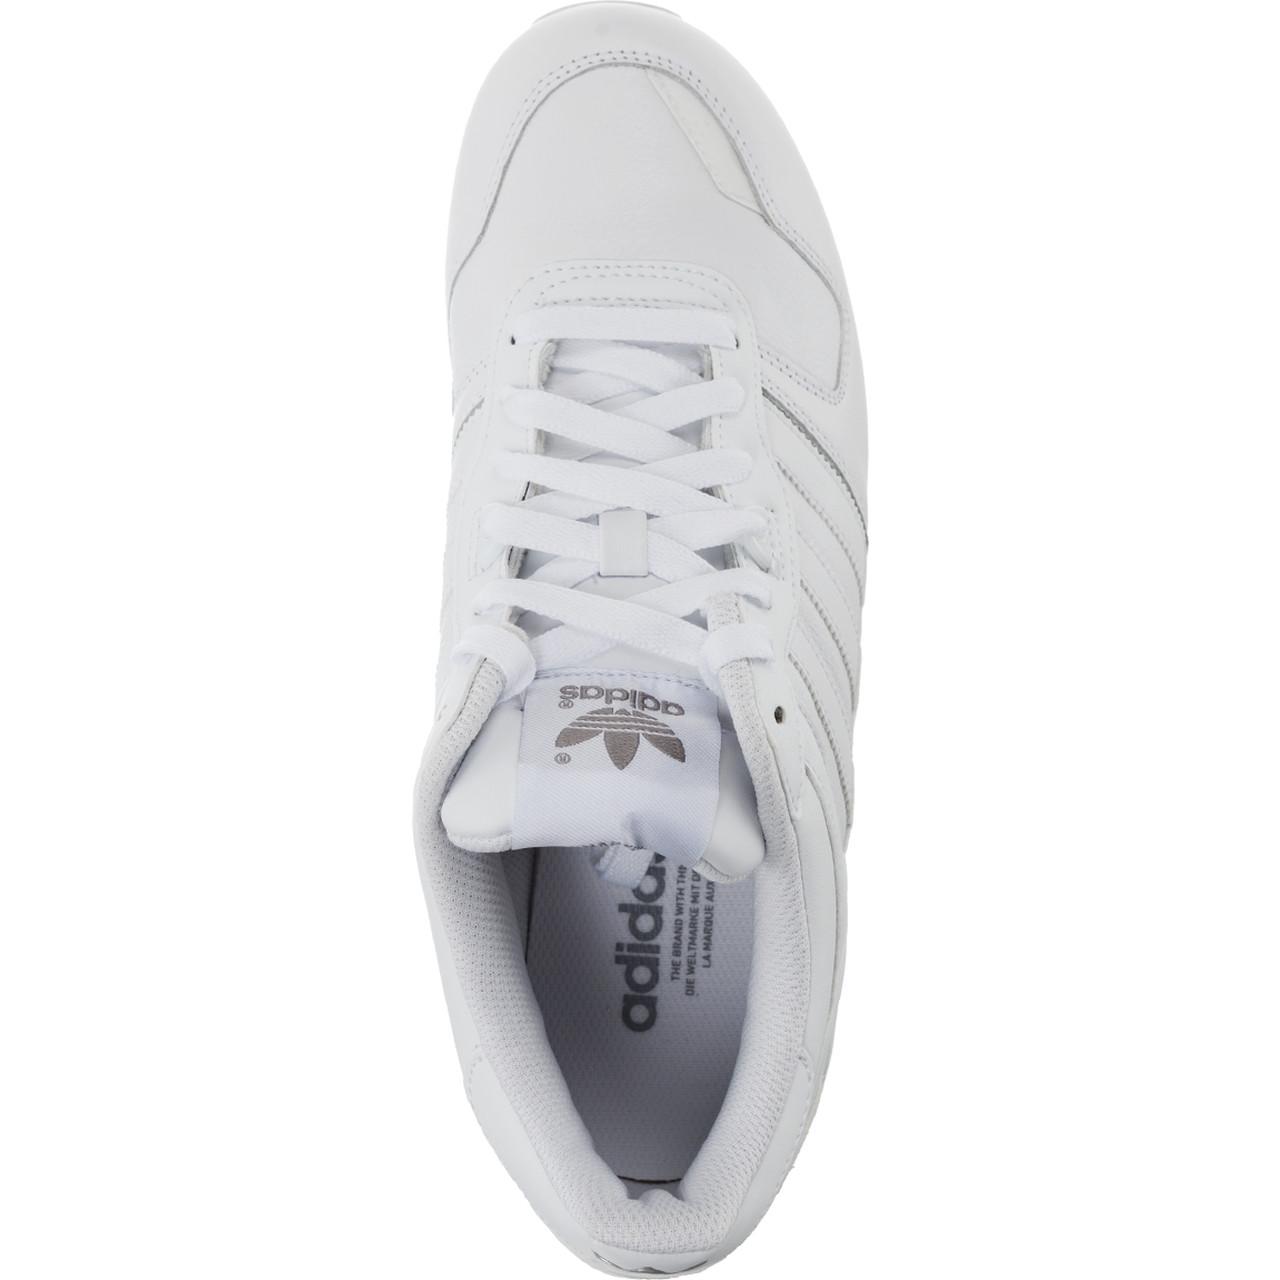 adidas zx 700 white/aluminium (g62110)